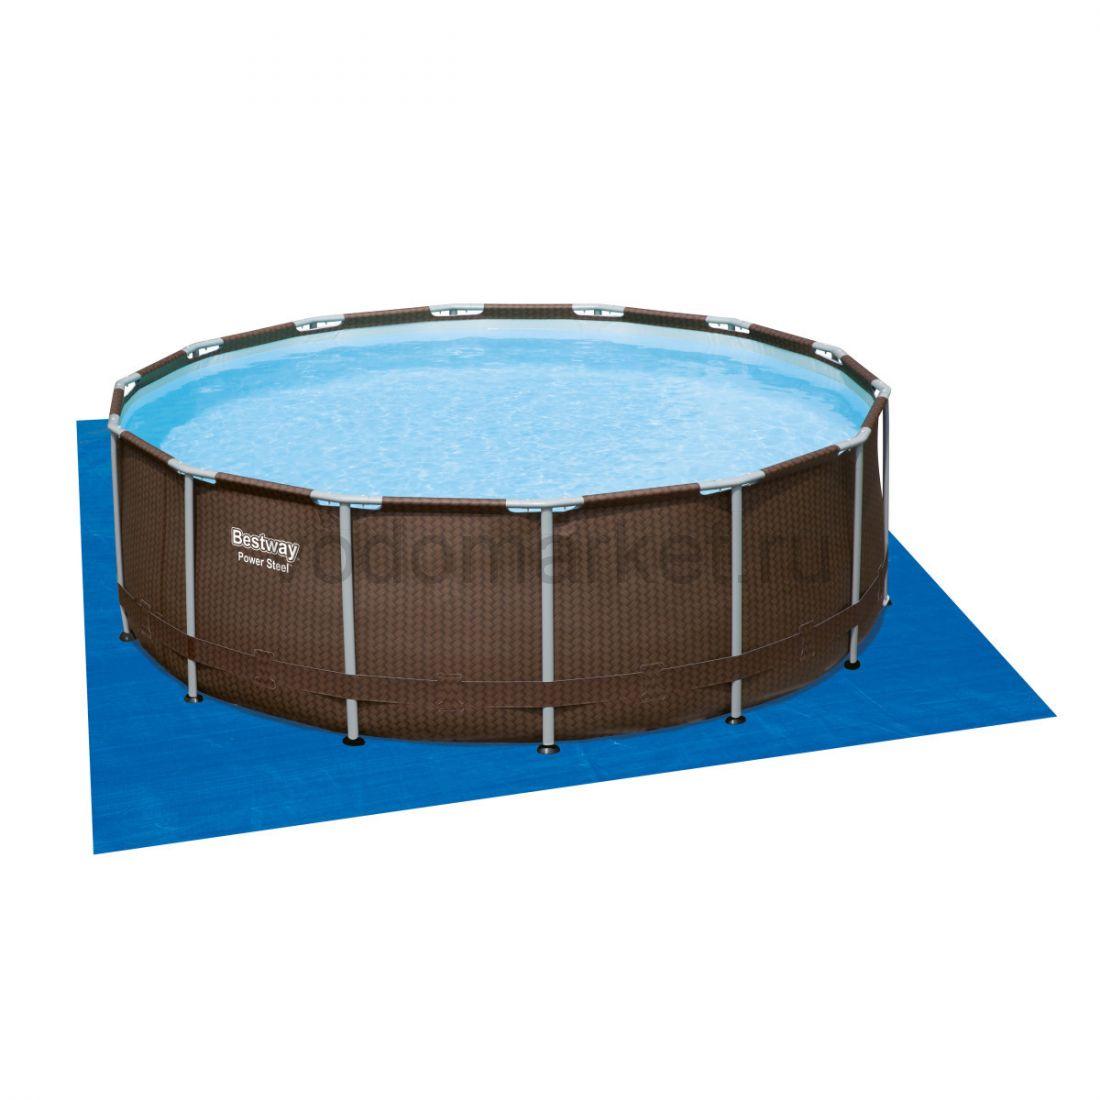 427х107 см (56664) Bestway каркасный бассейн ротанг DELUXE